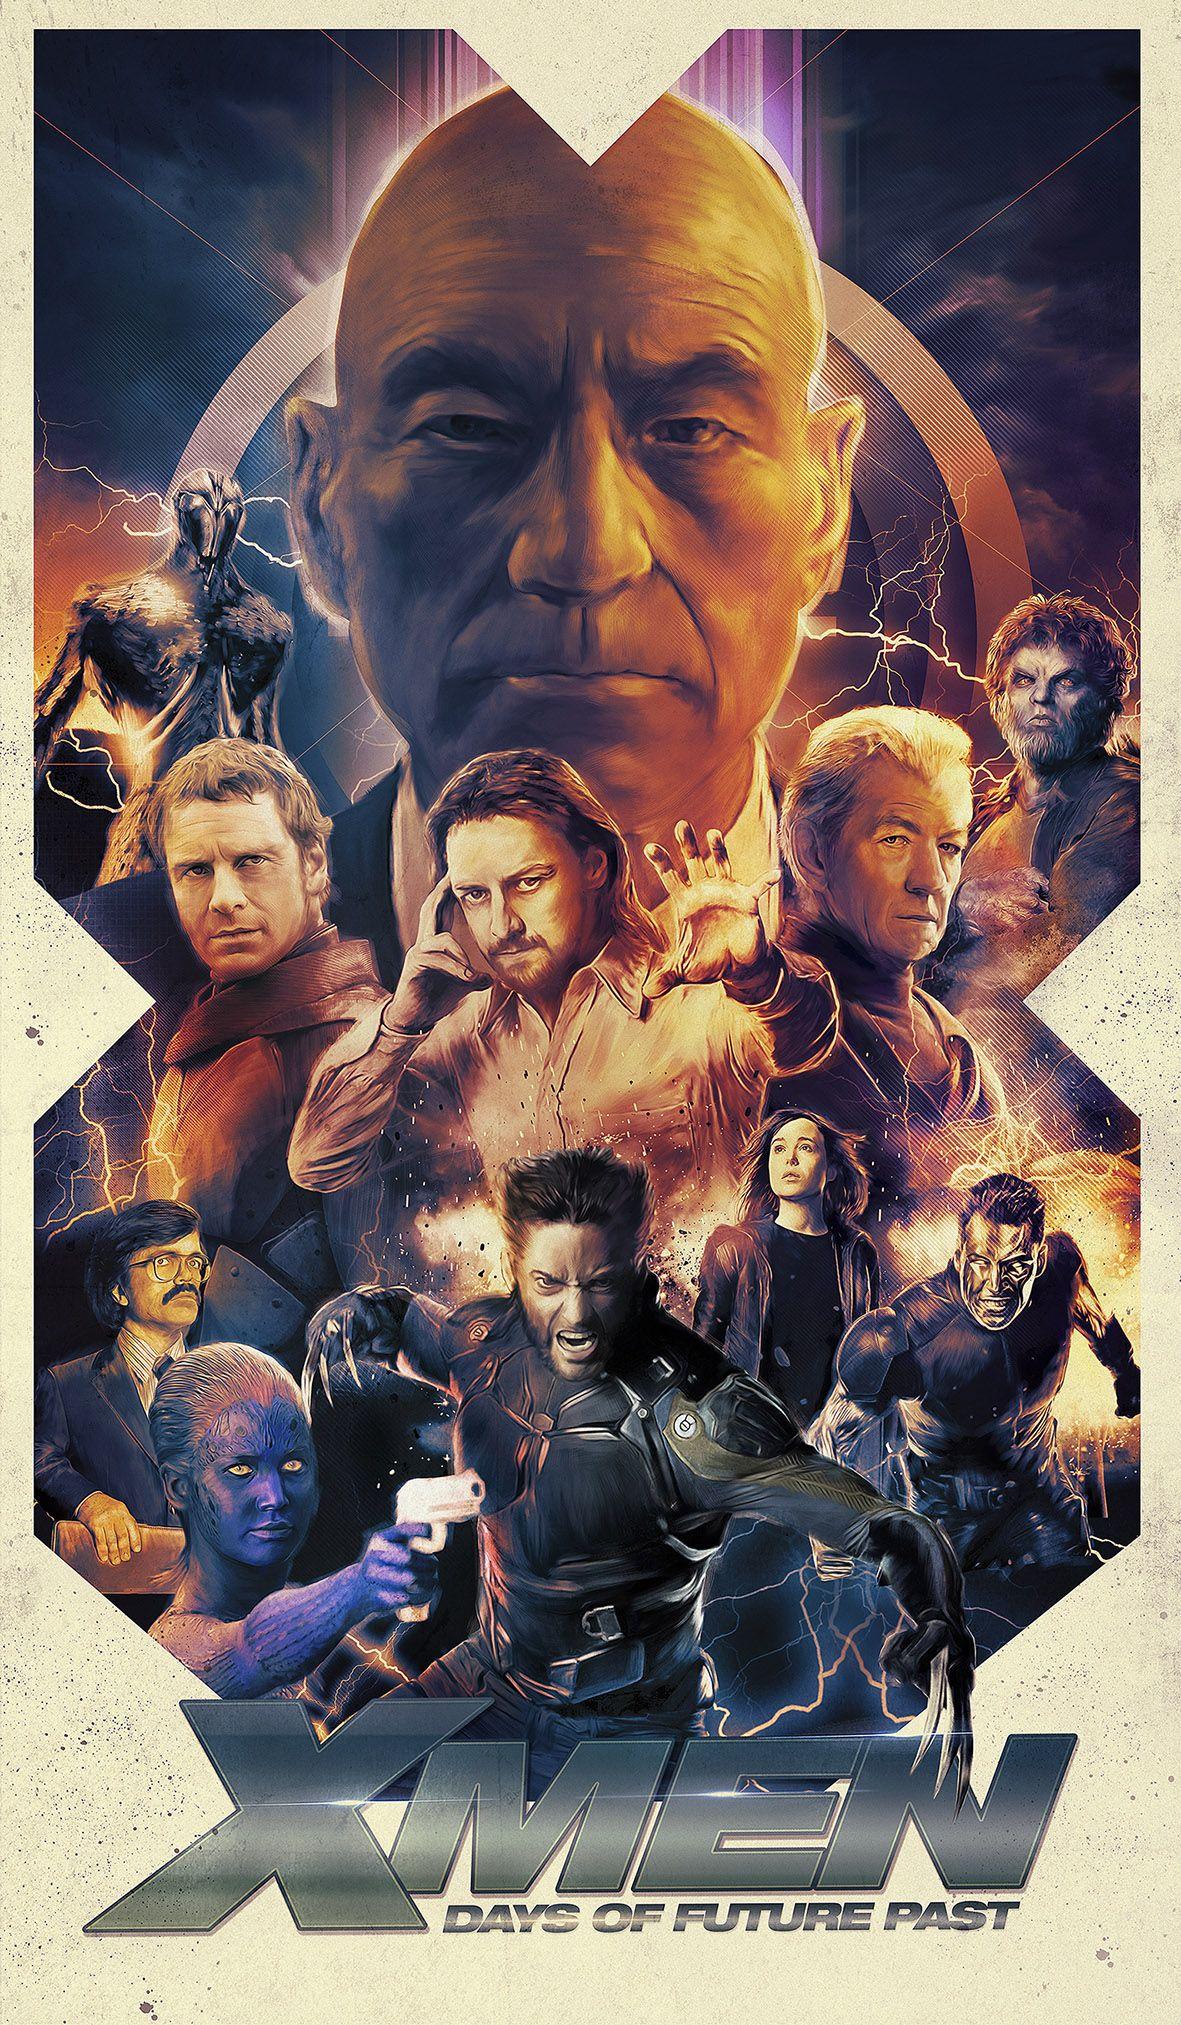 Richard Davies Days Of Future Past Jpg Filmplakate X Men Avengers